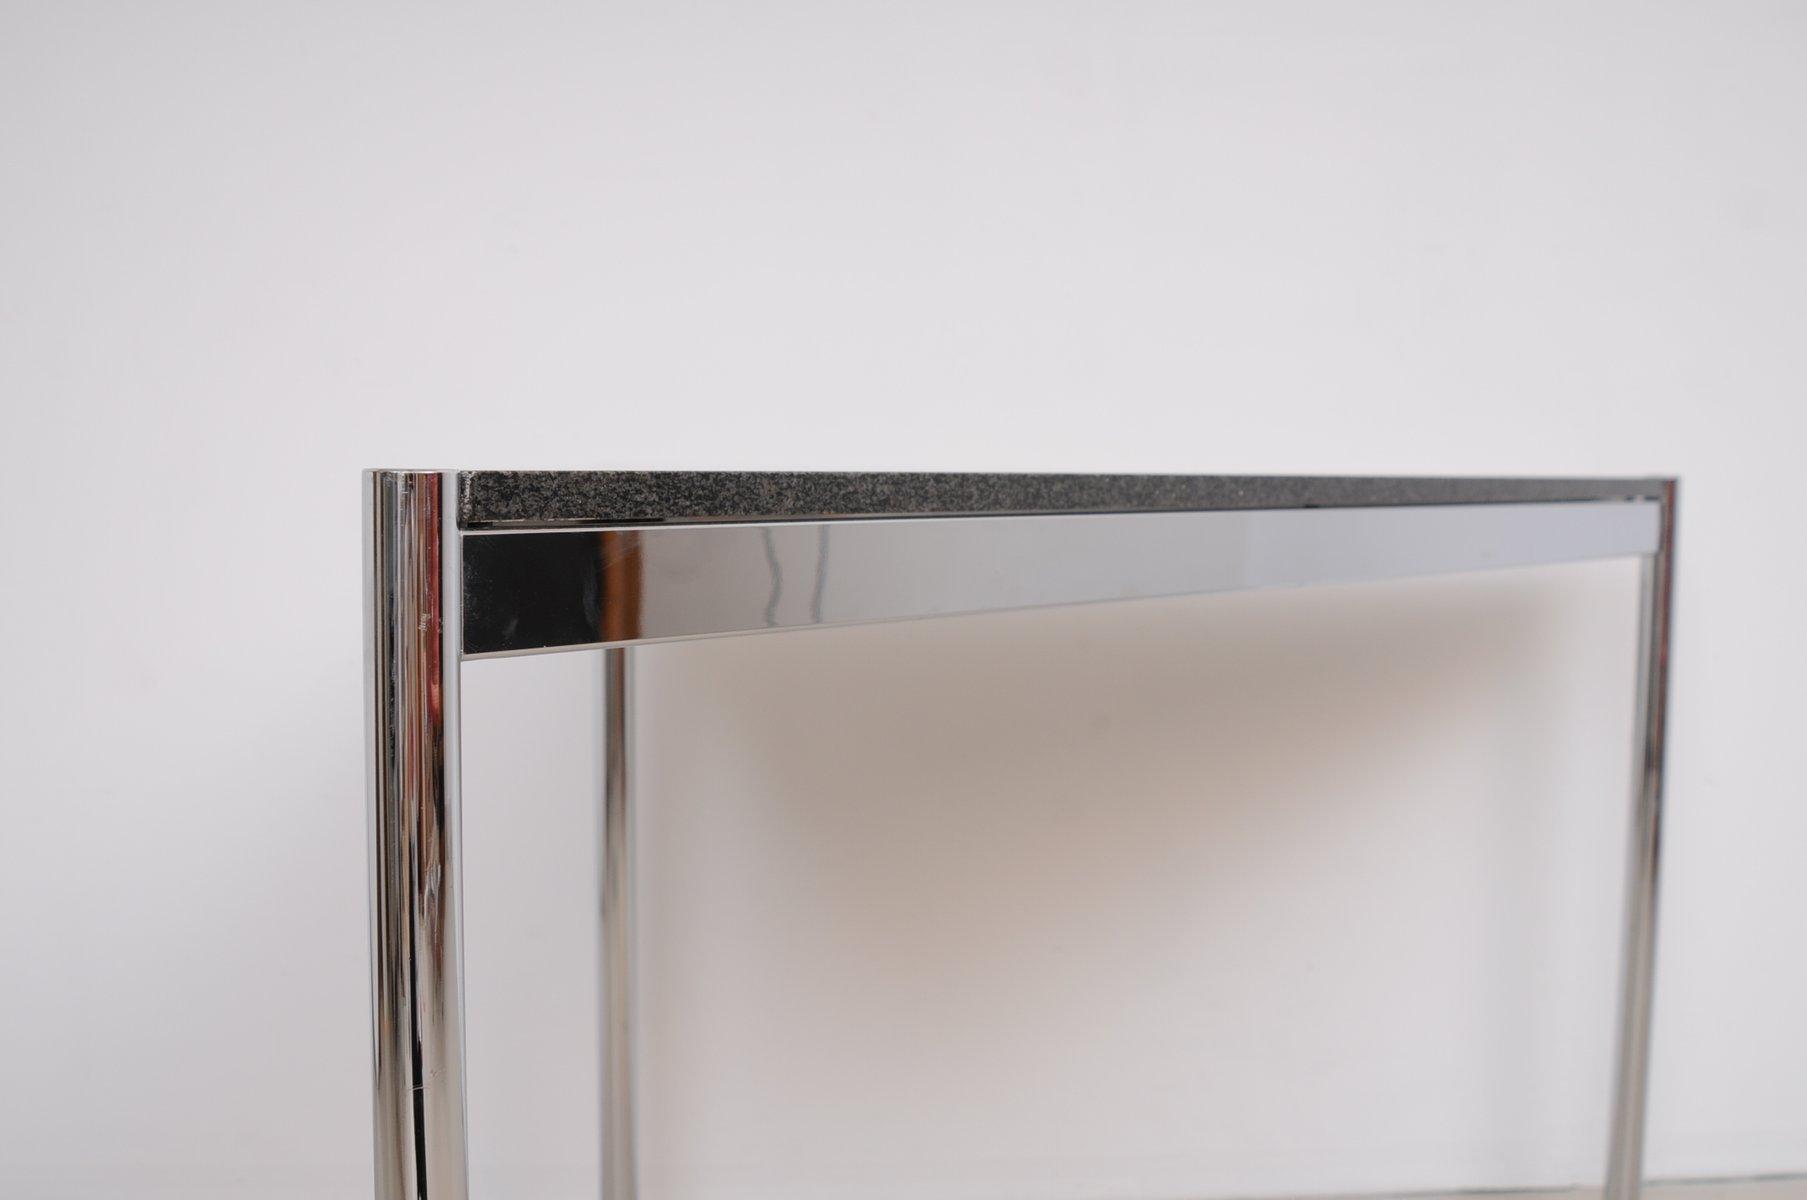 mid century triangular desk with granite top from usm haller for sale at pamono. Black Bedroom Furniture Sets. Home Design Ideas